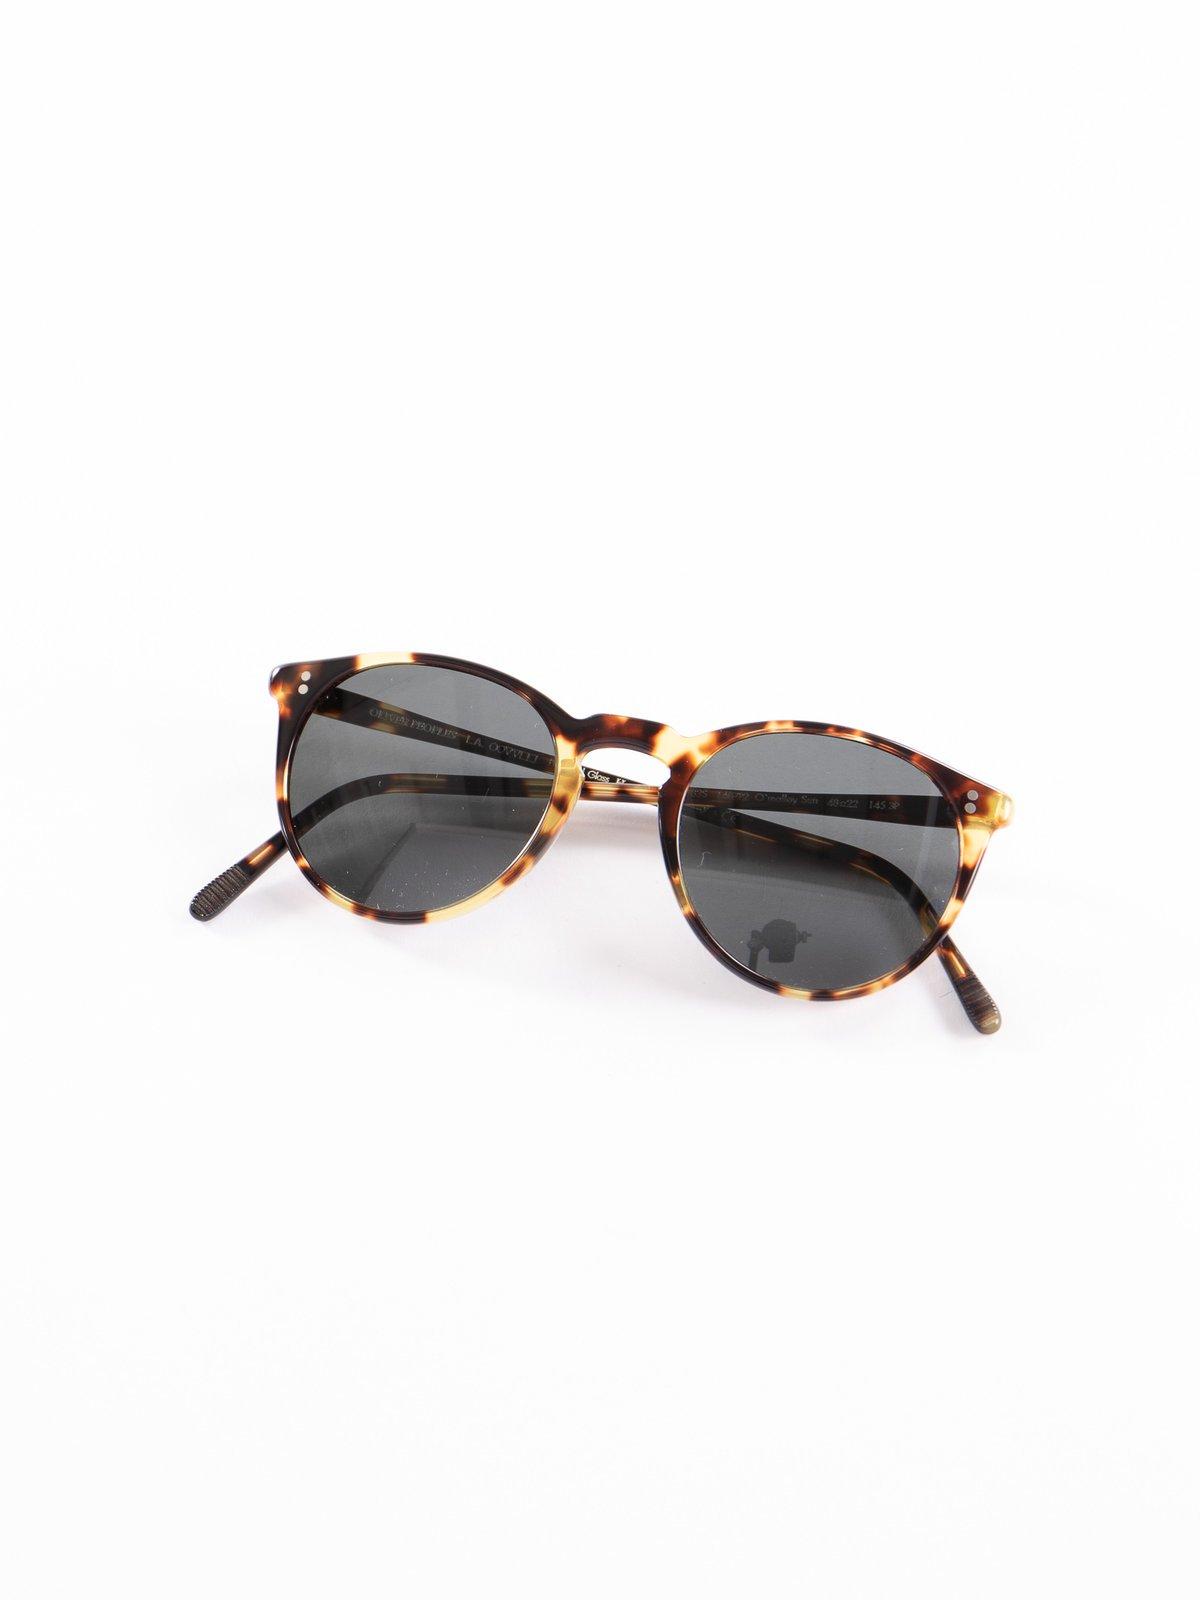 Vintage DTB/Dark Grey Polar O'Malley Sunglasses - Image 1